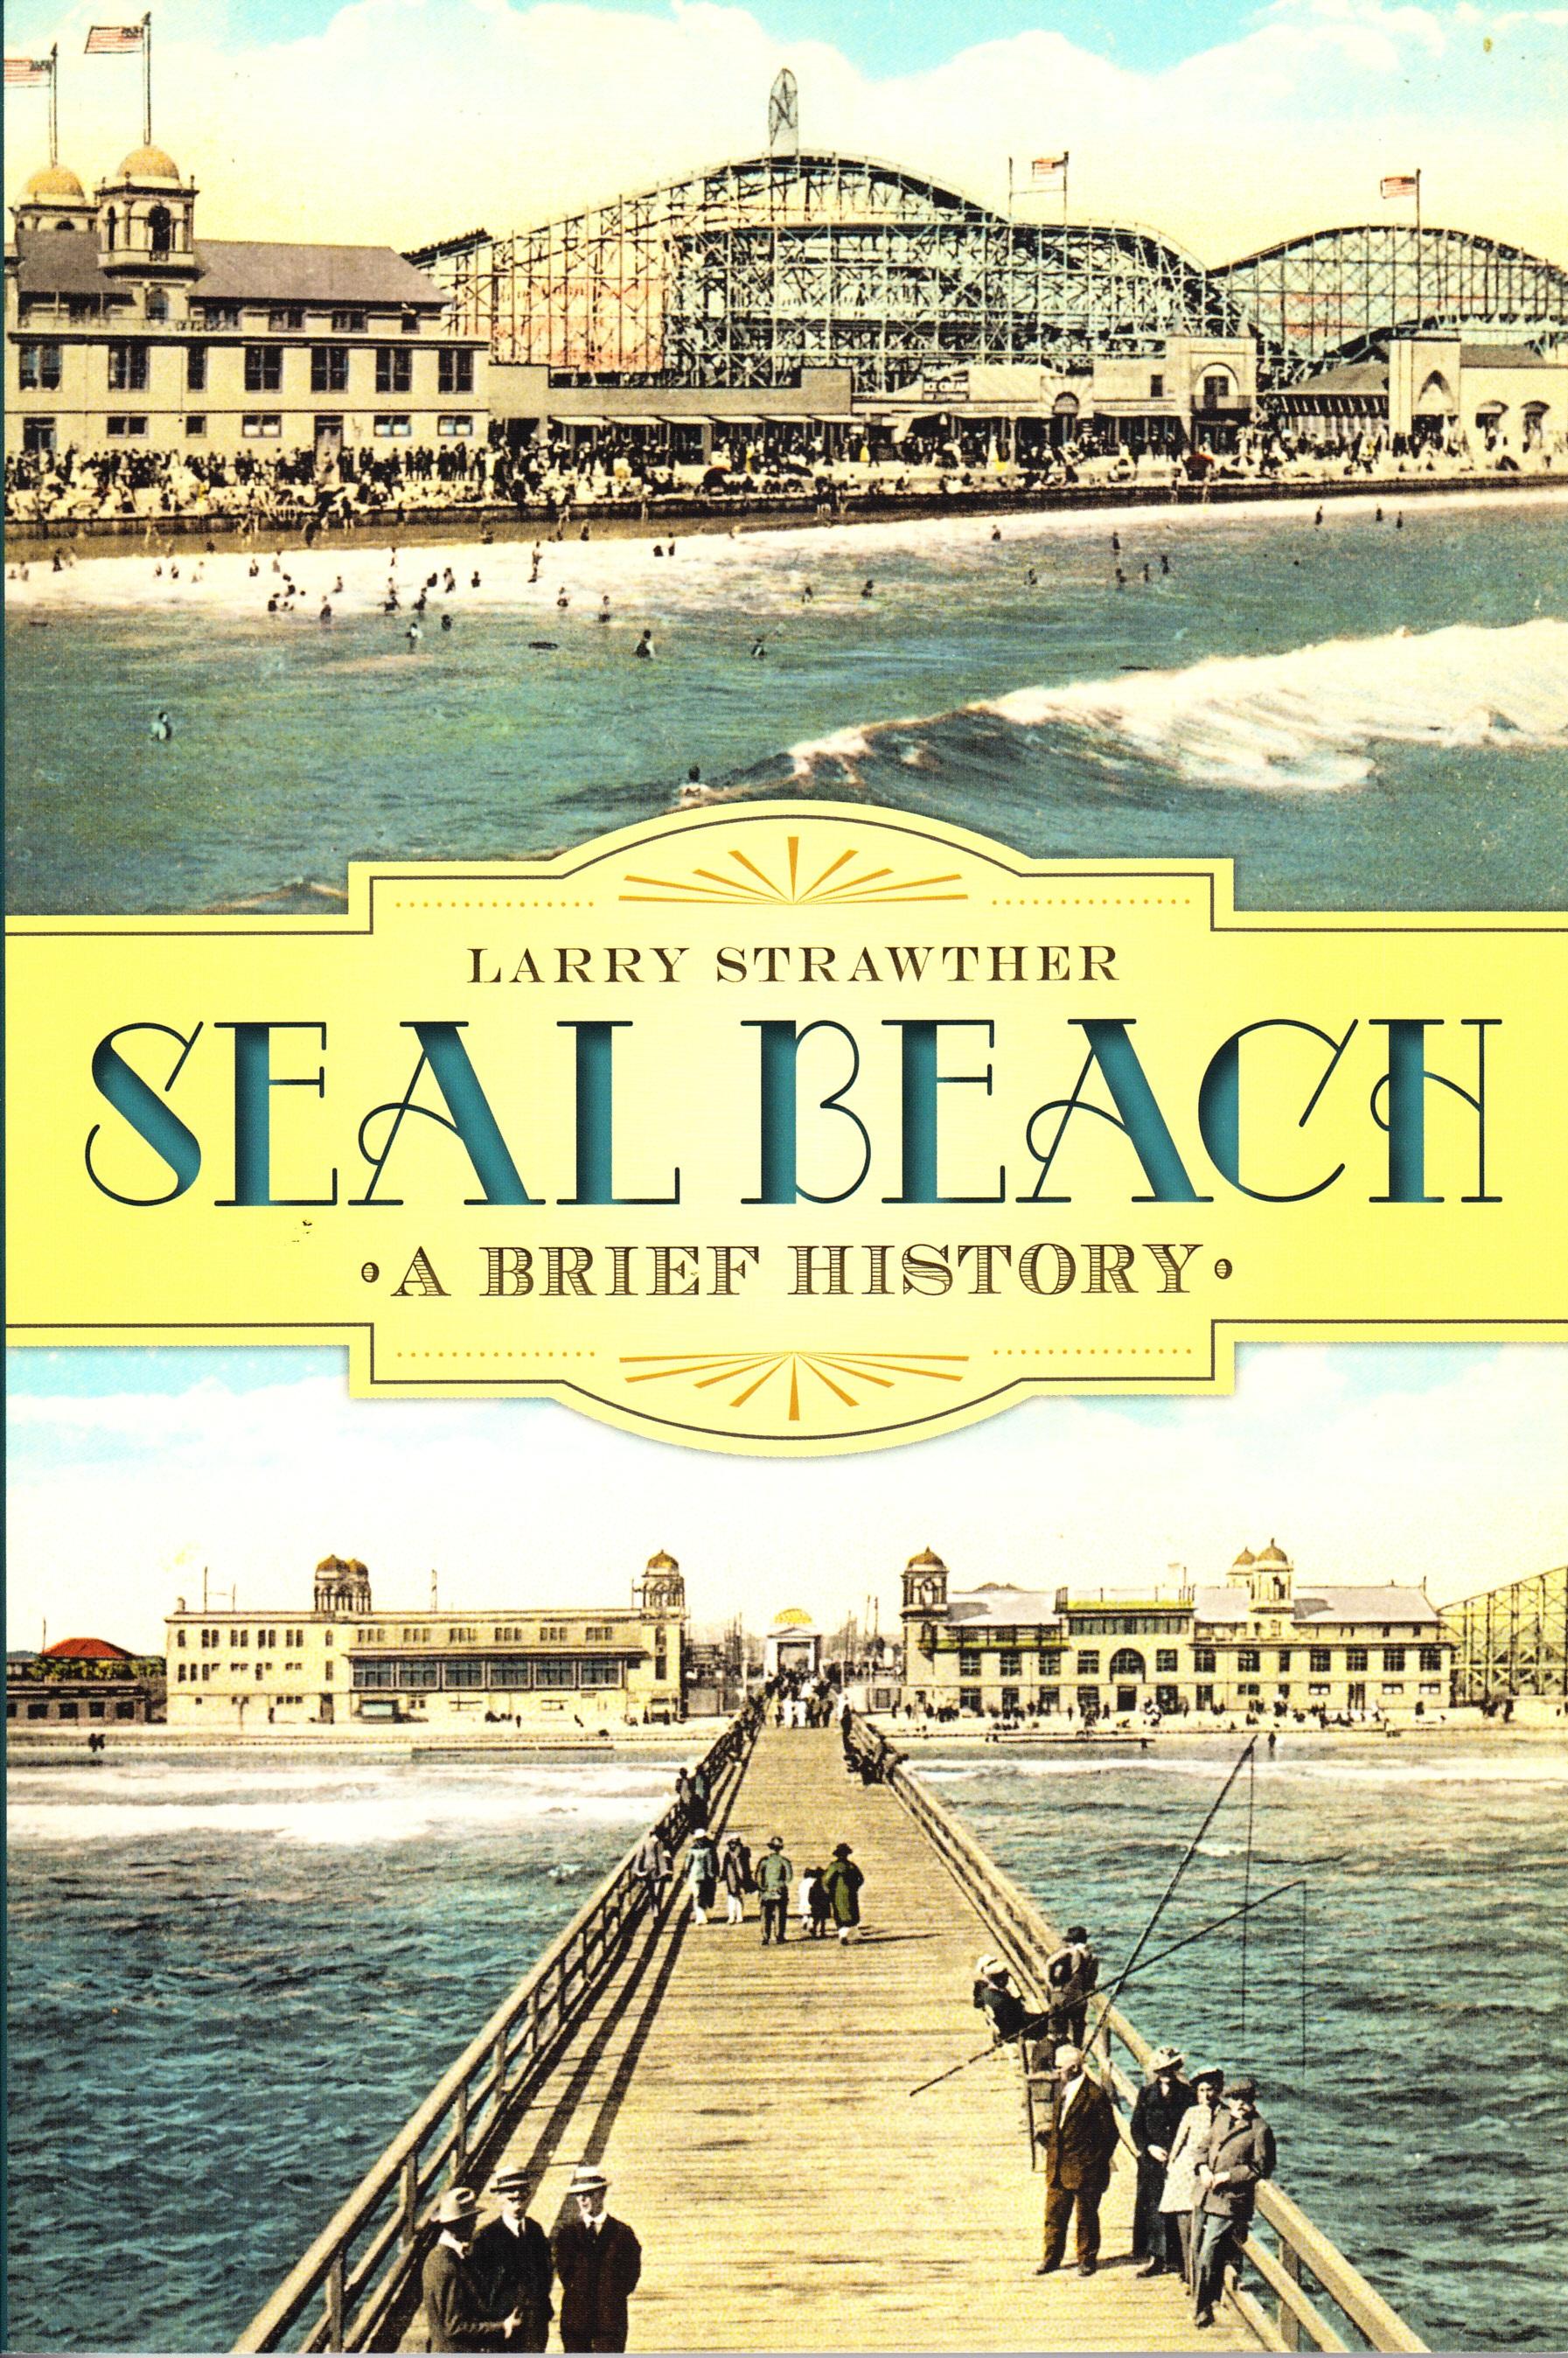 A brief history of Seal beach